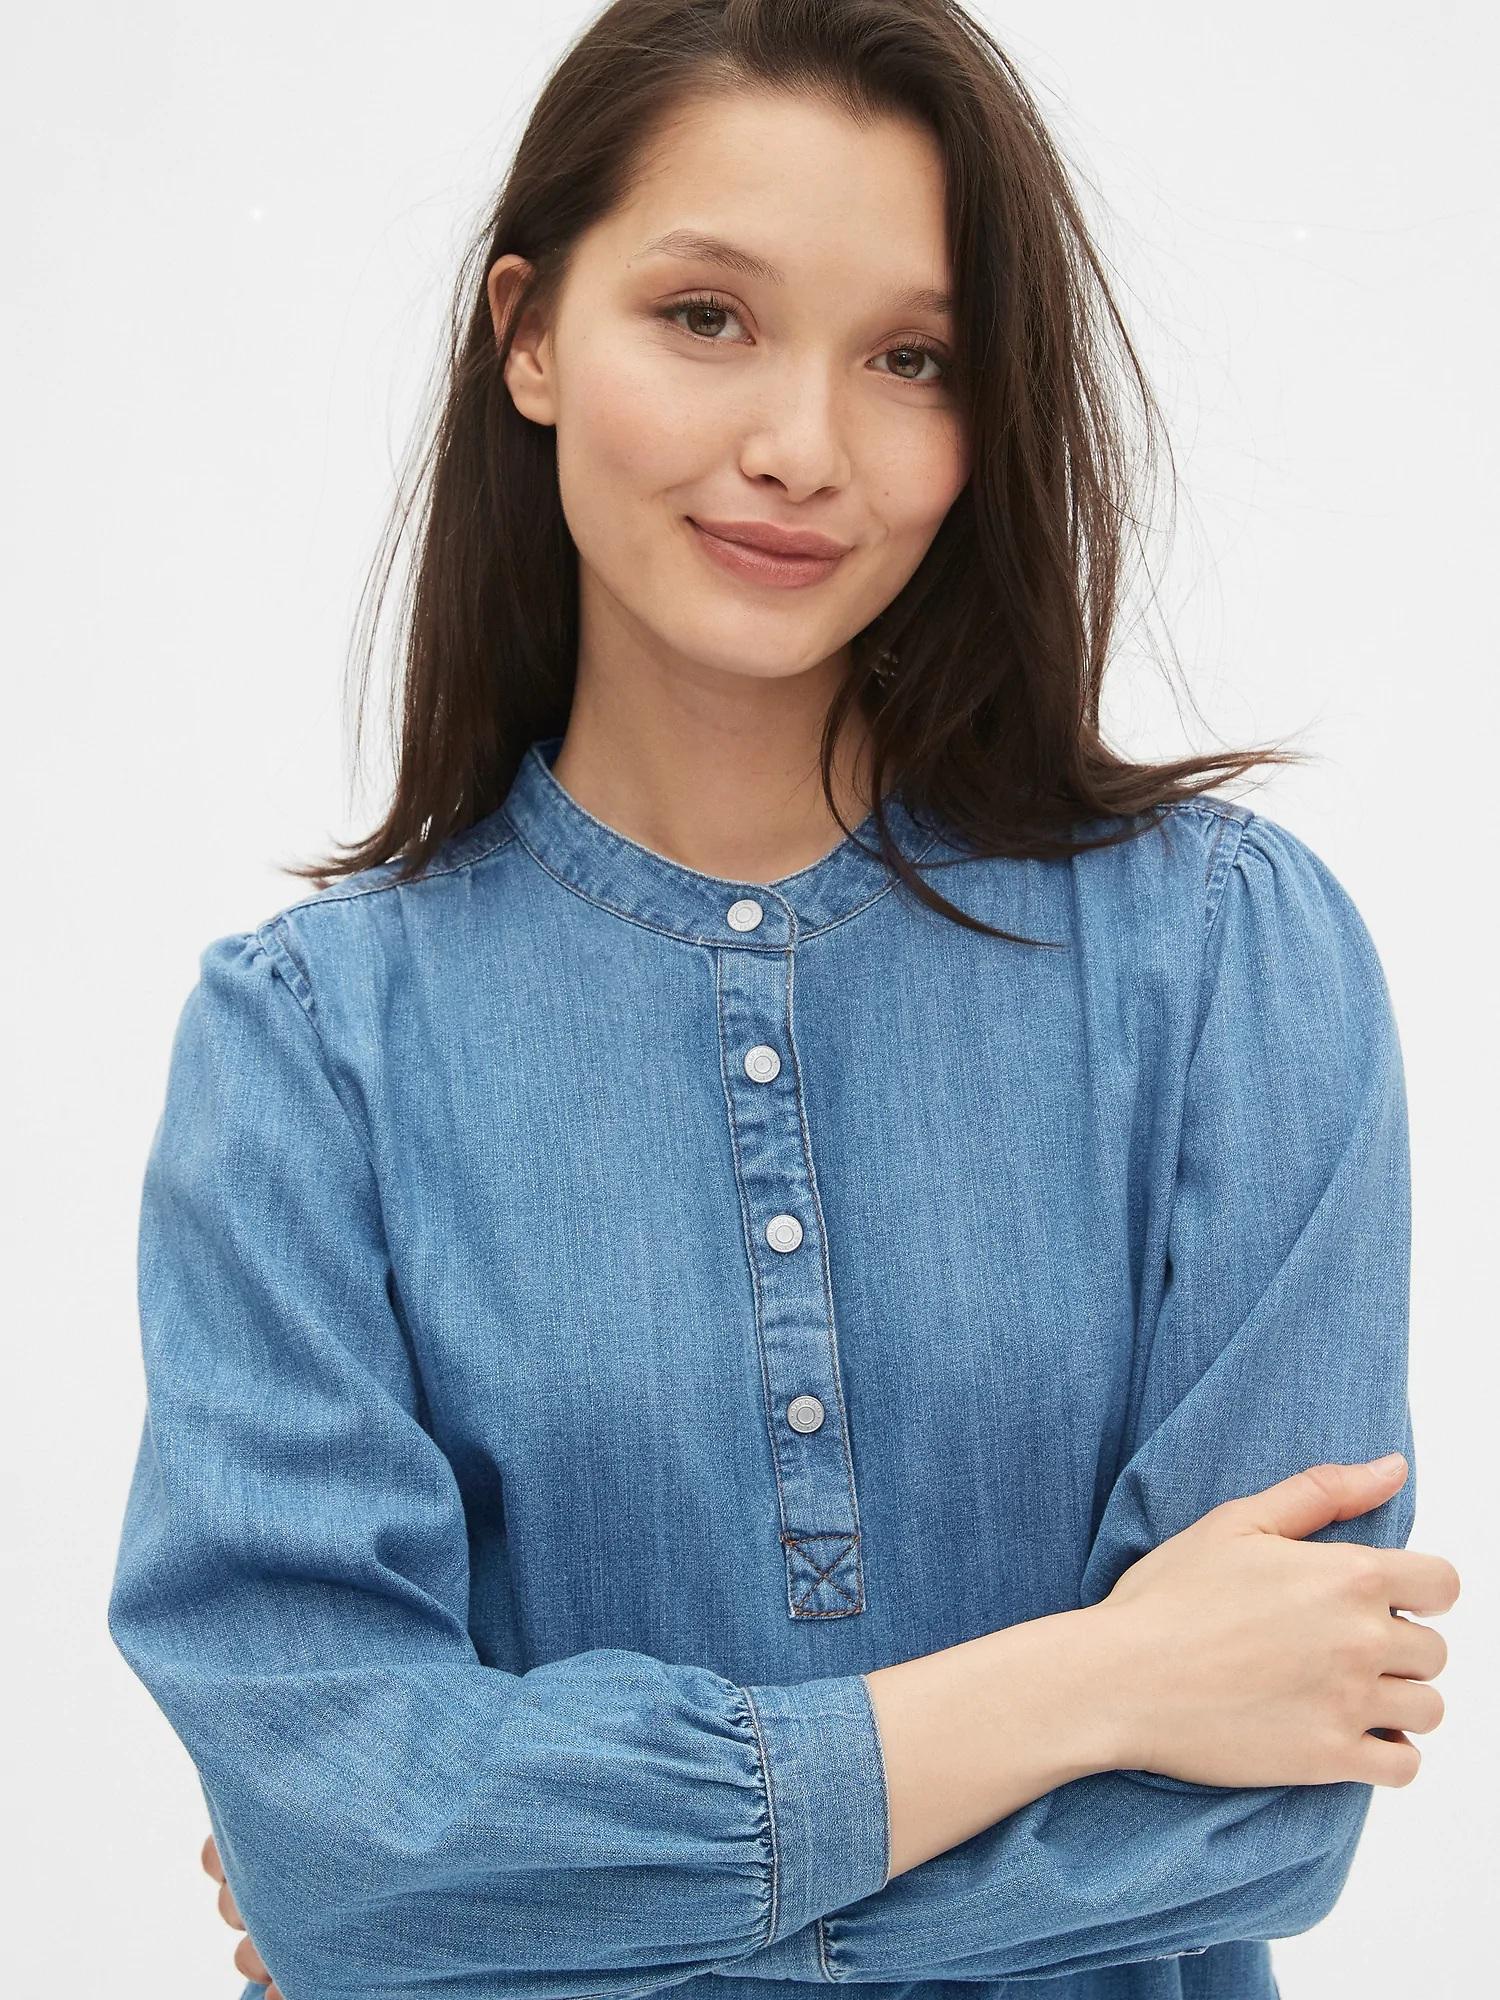 Popover Denim Shirt, $60, GAP